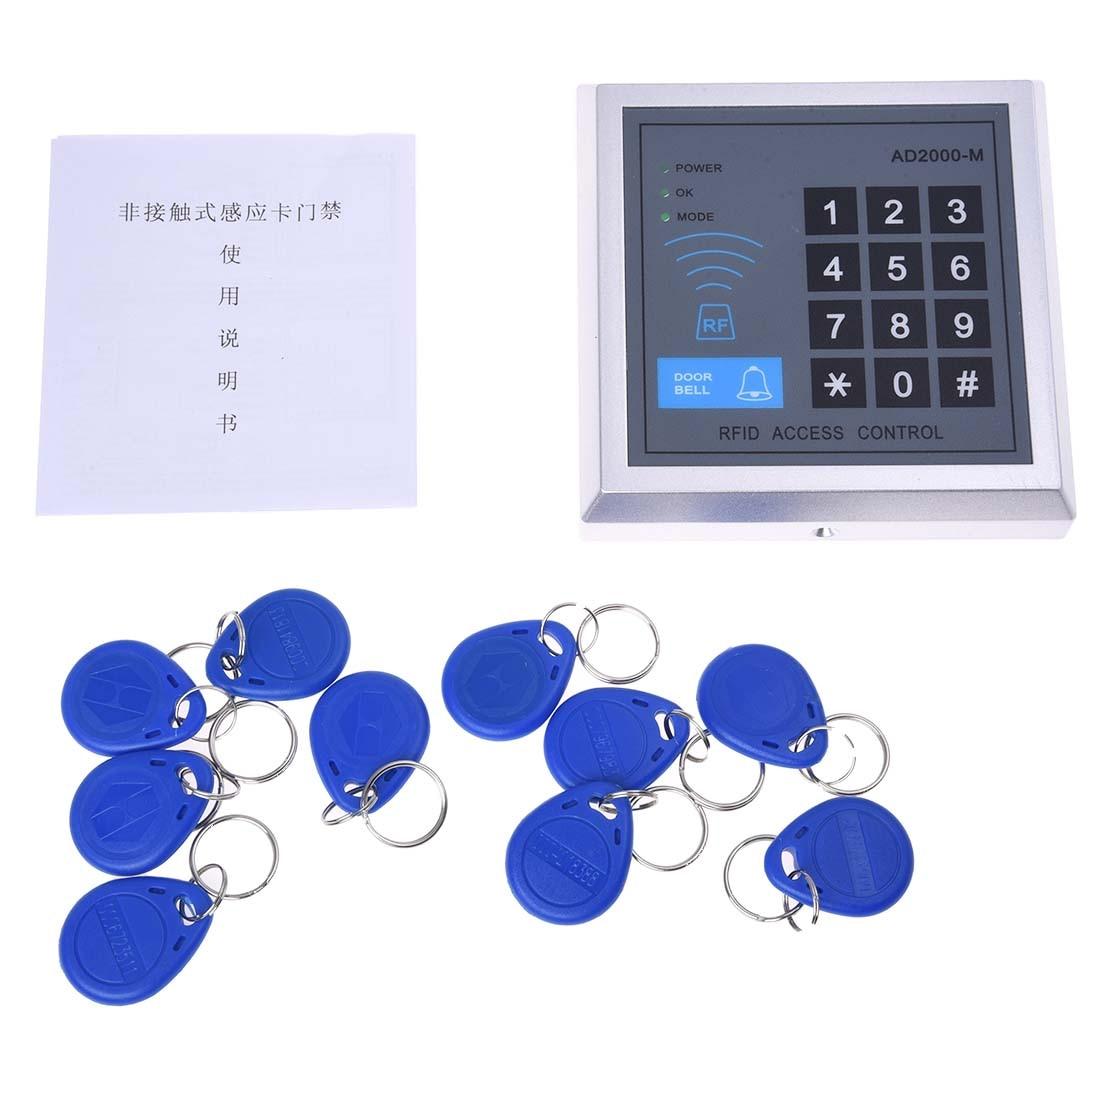 RFID  Keypad Door Access Control System Kit Electric Magnetic Electronic Door Lock+power Supply+10pcs Key Fobs Full Set